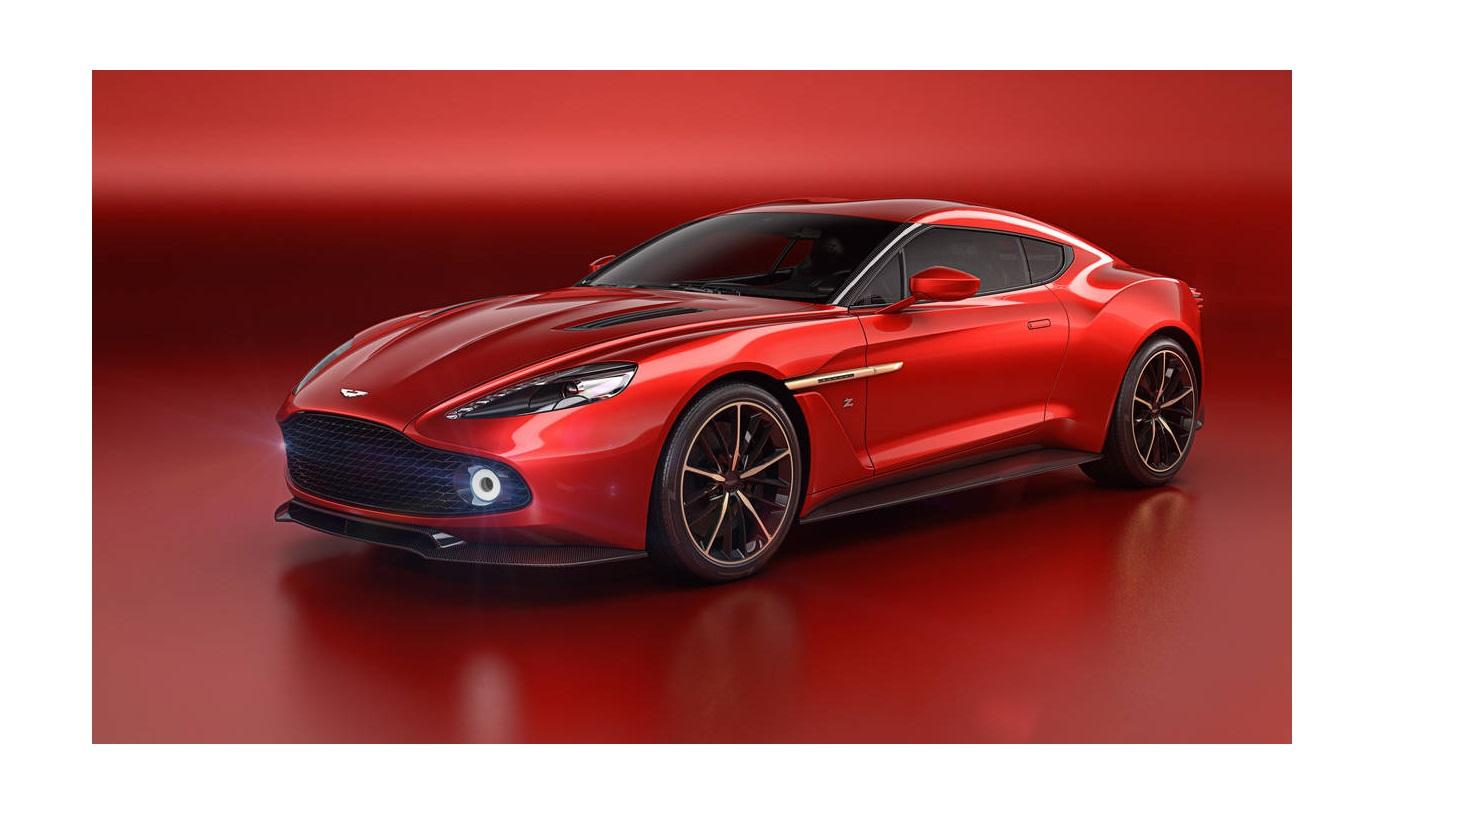 Aston Martin Vanquish Zagato 2017 V12 in UAE: New Car Prices, Specs